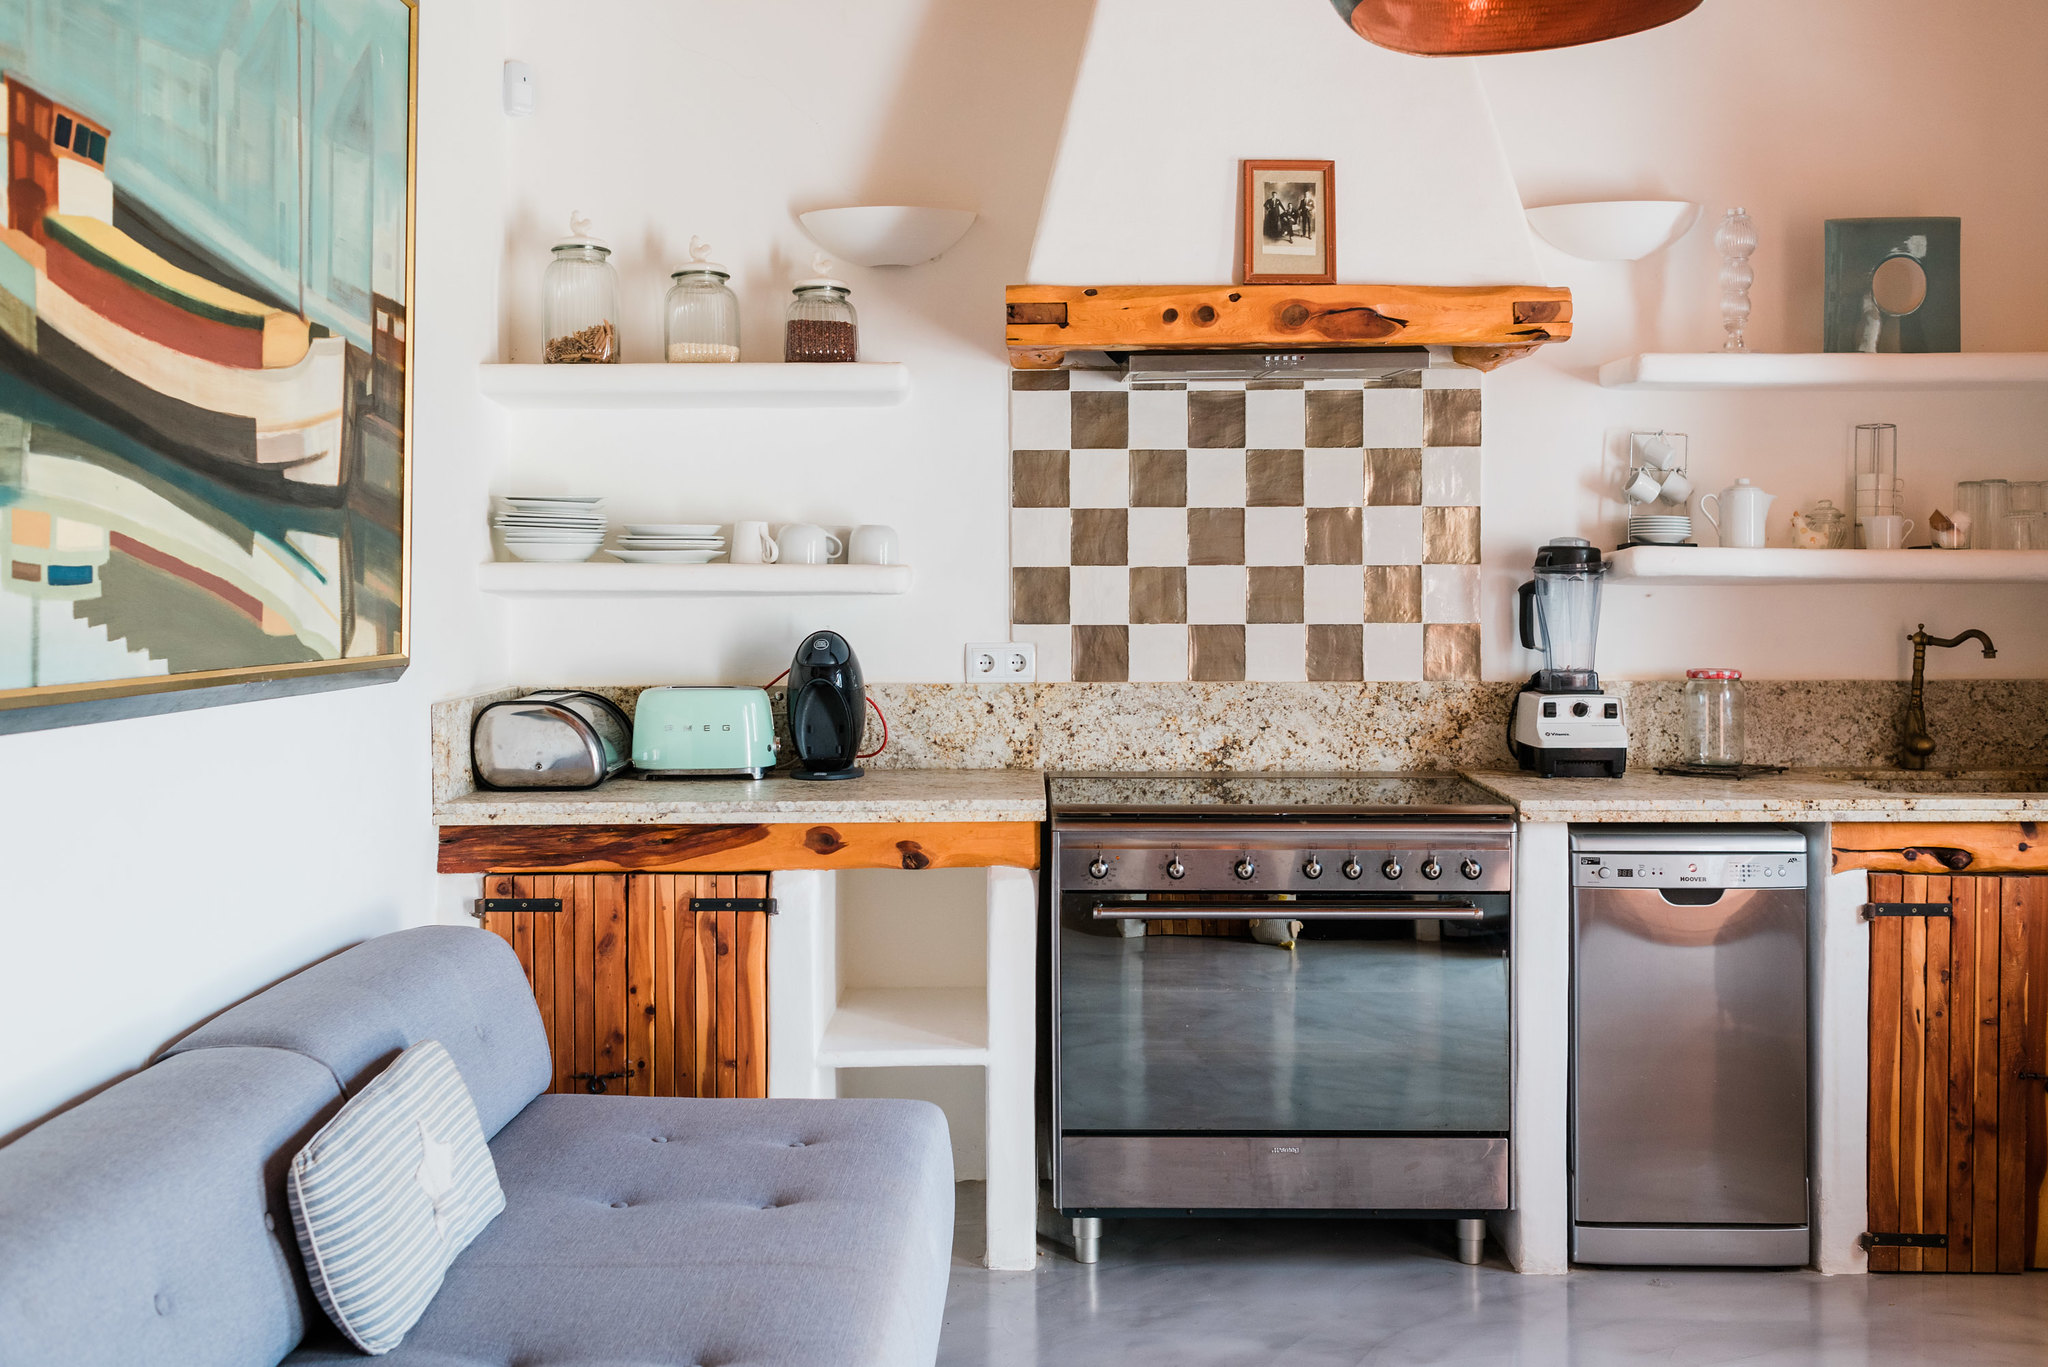 https://www.white-ibiza.com/wp-content/uploads/2020/06/white-ibiza-villas-los-corrales-interior-kitchenette.jpg